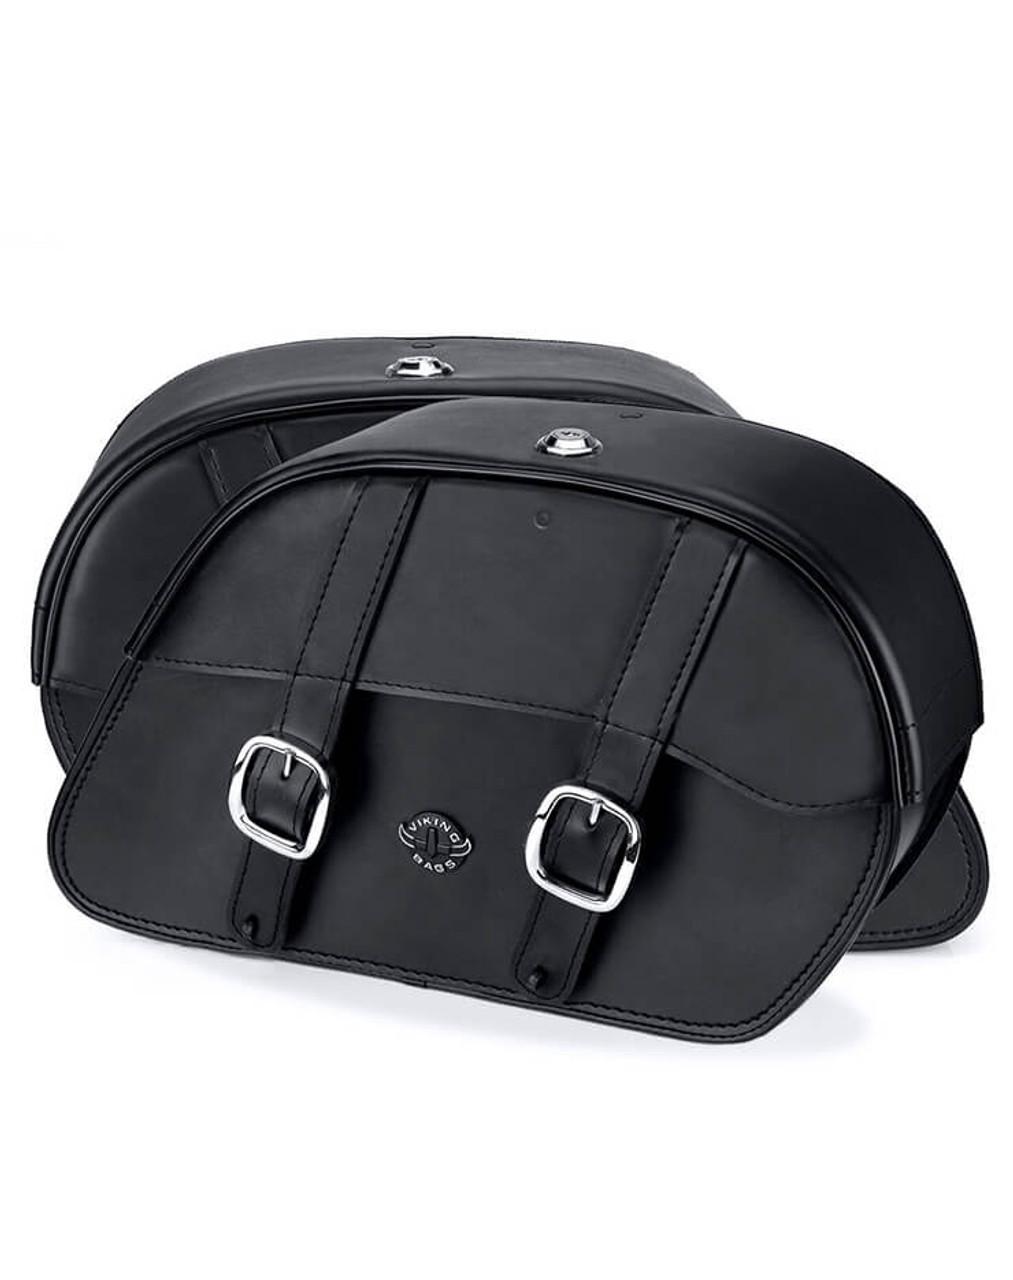 Kawasaki 1600 Mean Streak Charger Slanted Medium Motorcycle Saddlebags Both Bags View